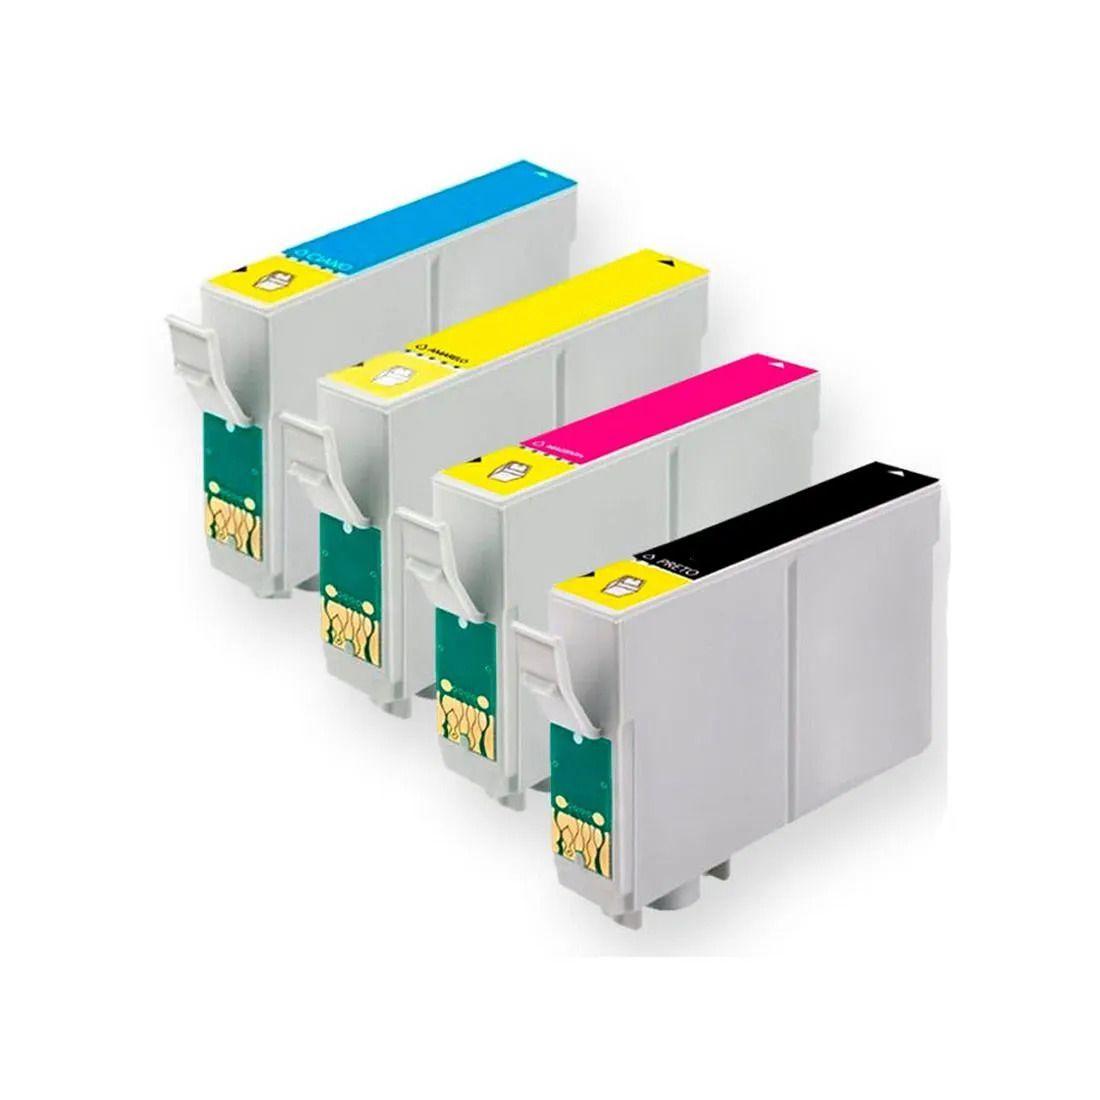 Kit 4 cartuchos T133 133 preto e coloridos compatíveis Epson Tx235w Tx320f Tx420w Tx430w